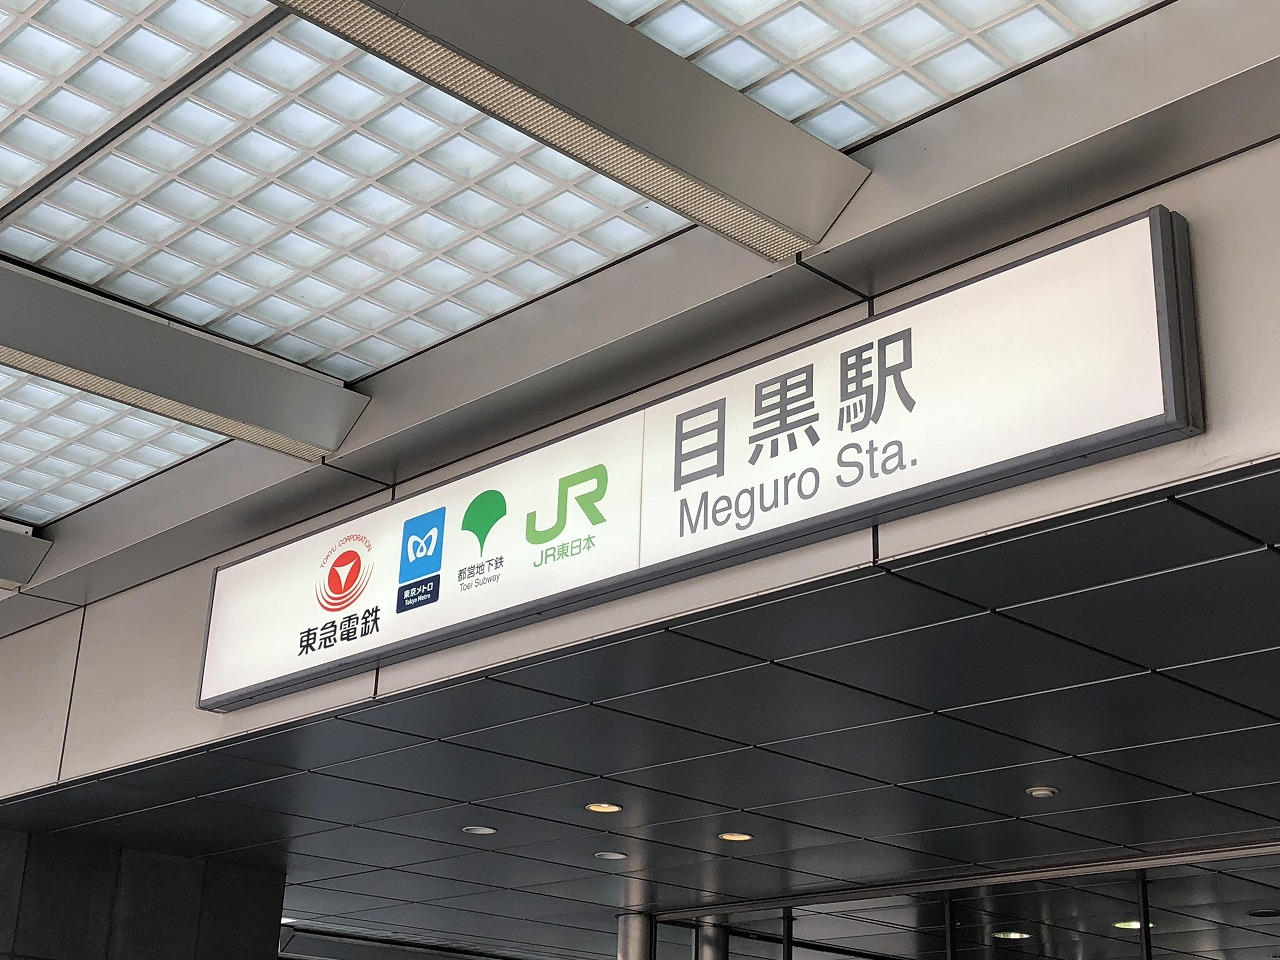 JR山手線・東急目黒線「目黒」駅の土地・マンション・戸建相場を調べてみた